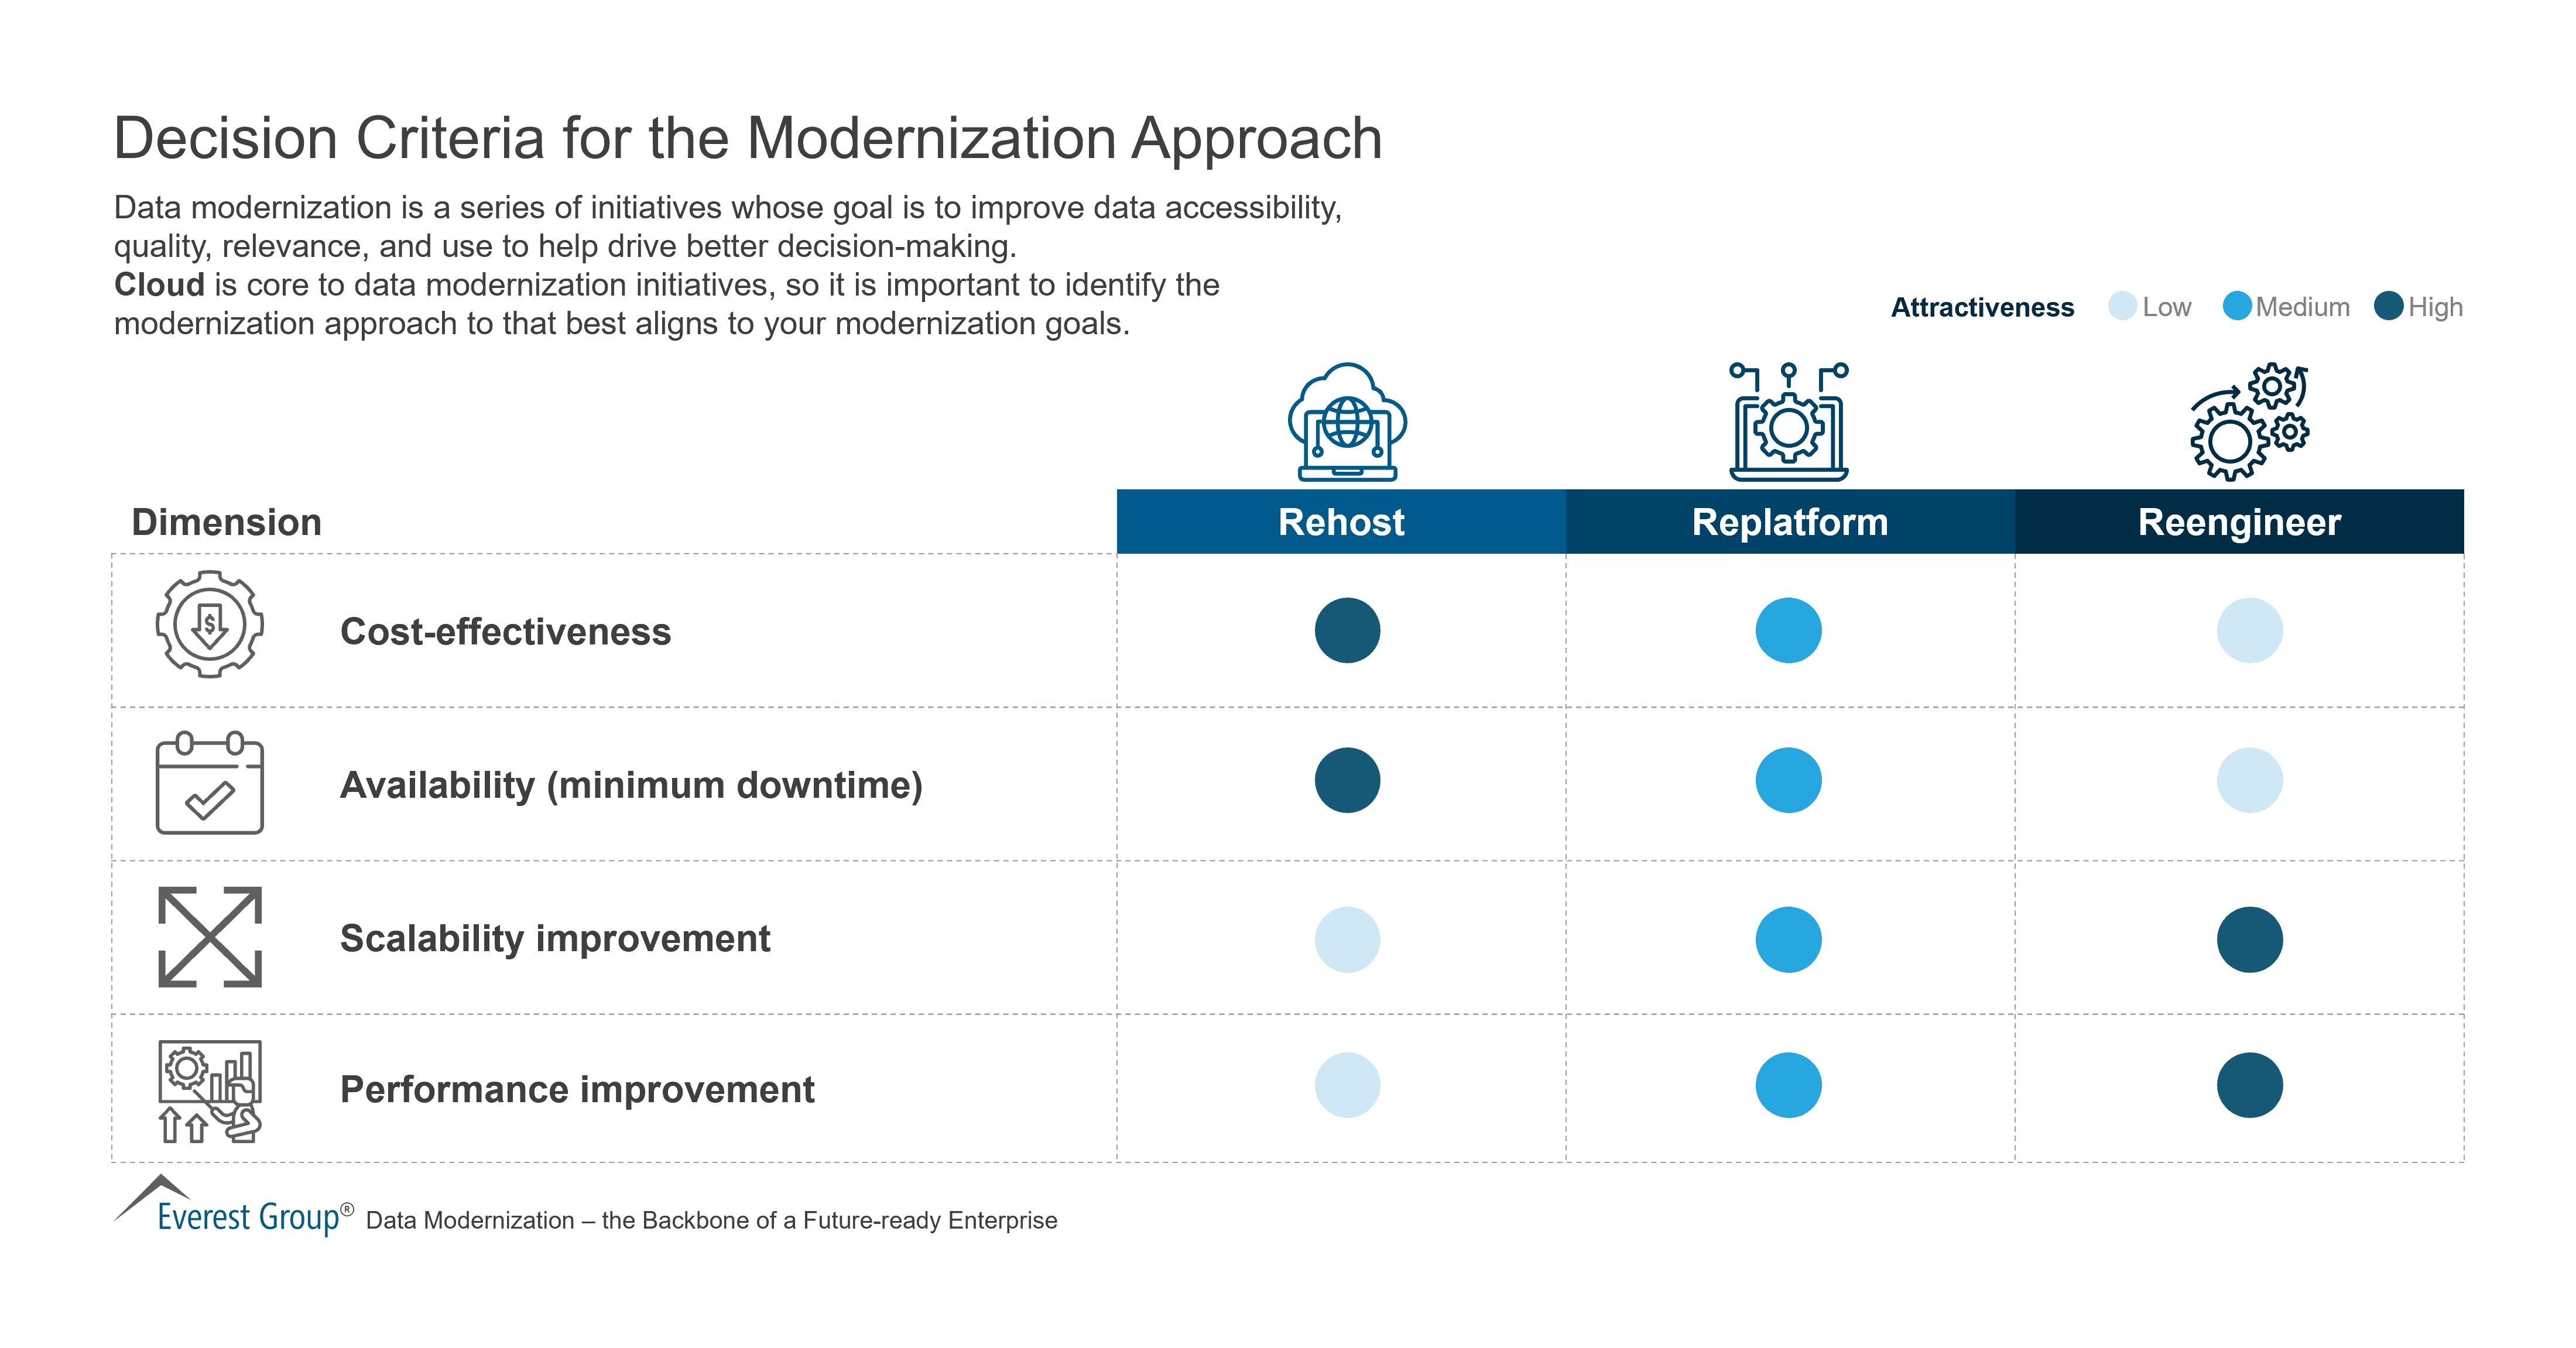 Decision Criteria for the Modernization Approach